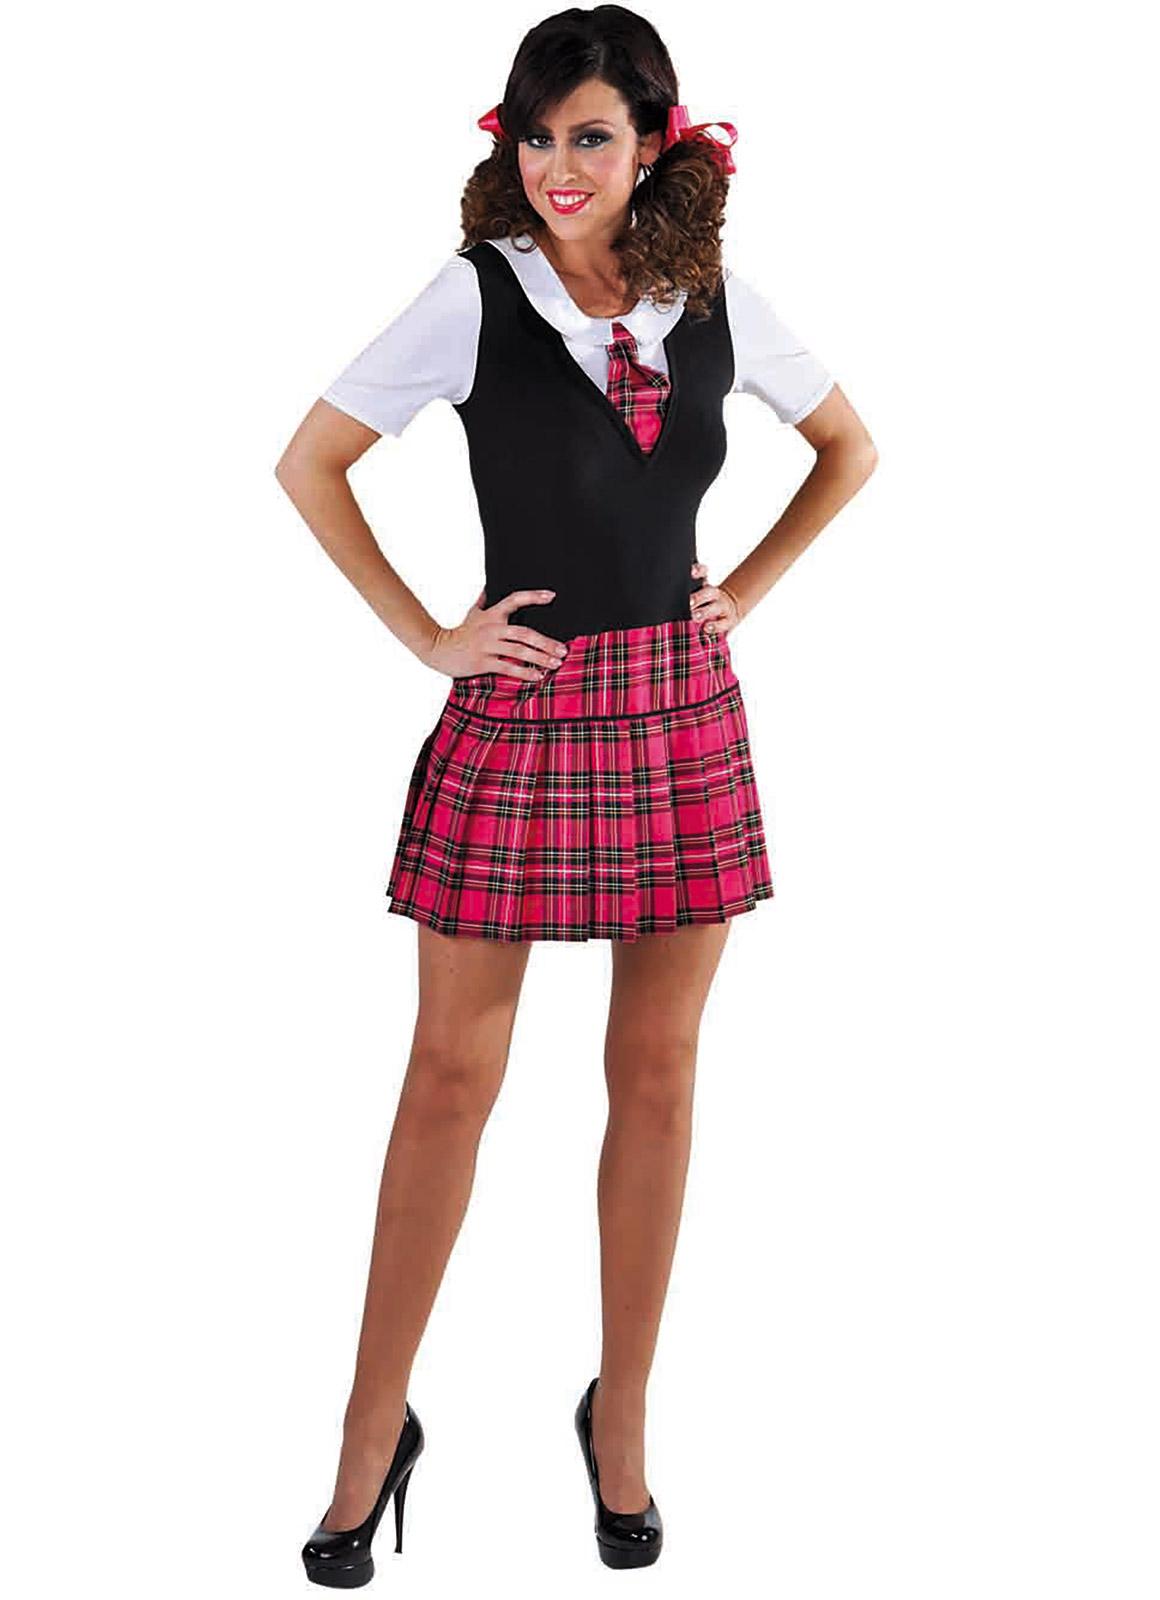 image Slutty schoolgirl fantasizes about her math teacher